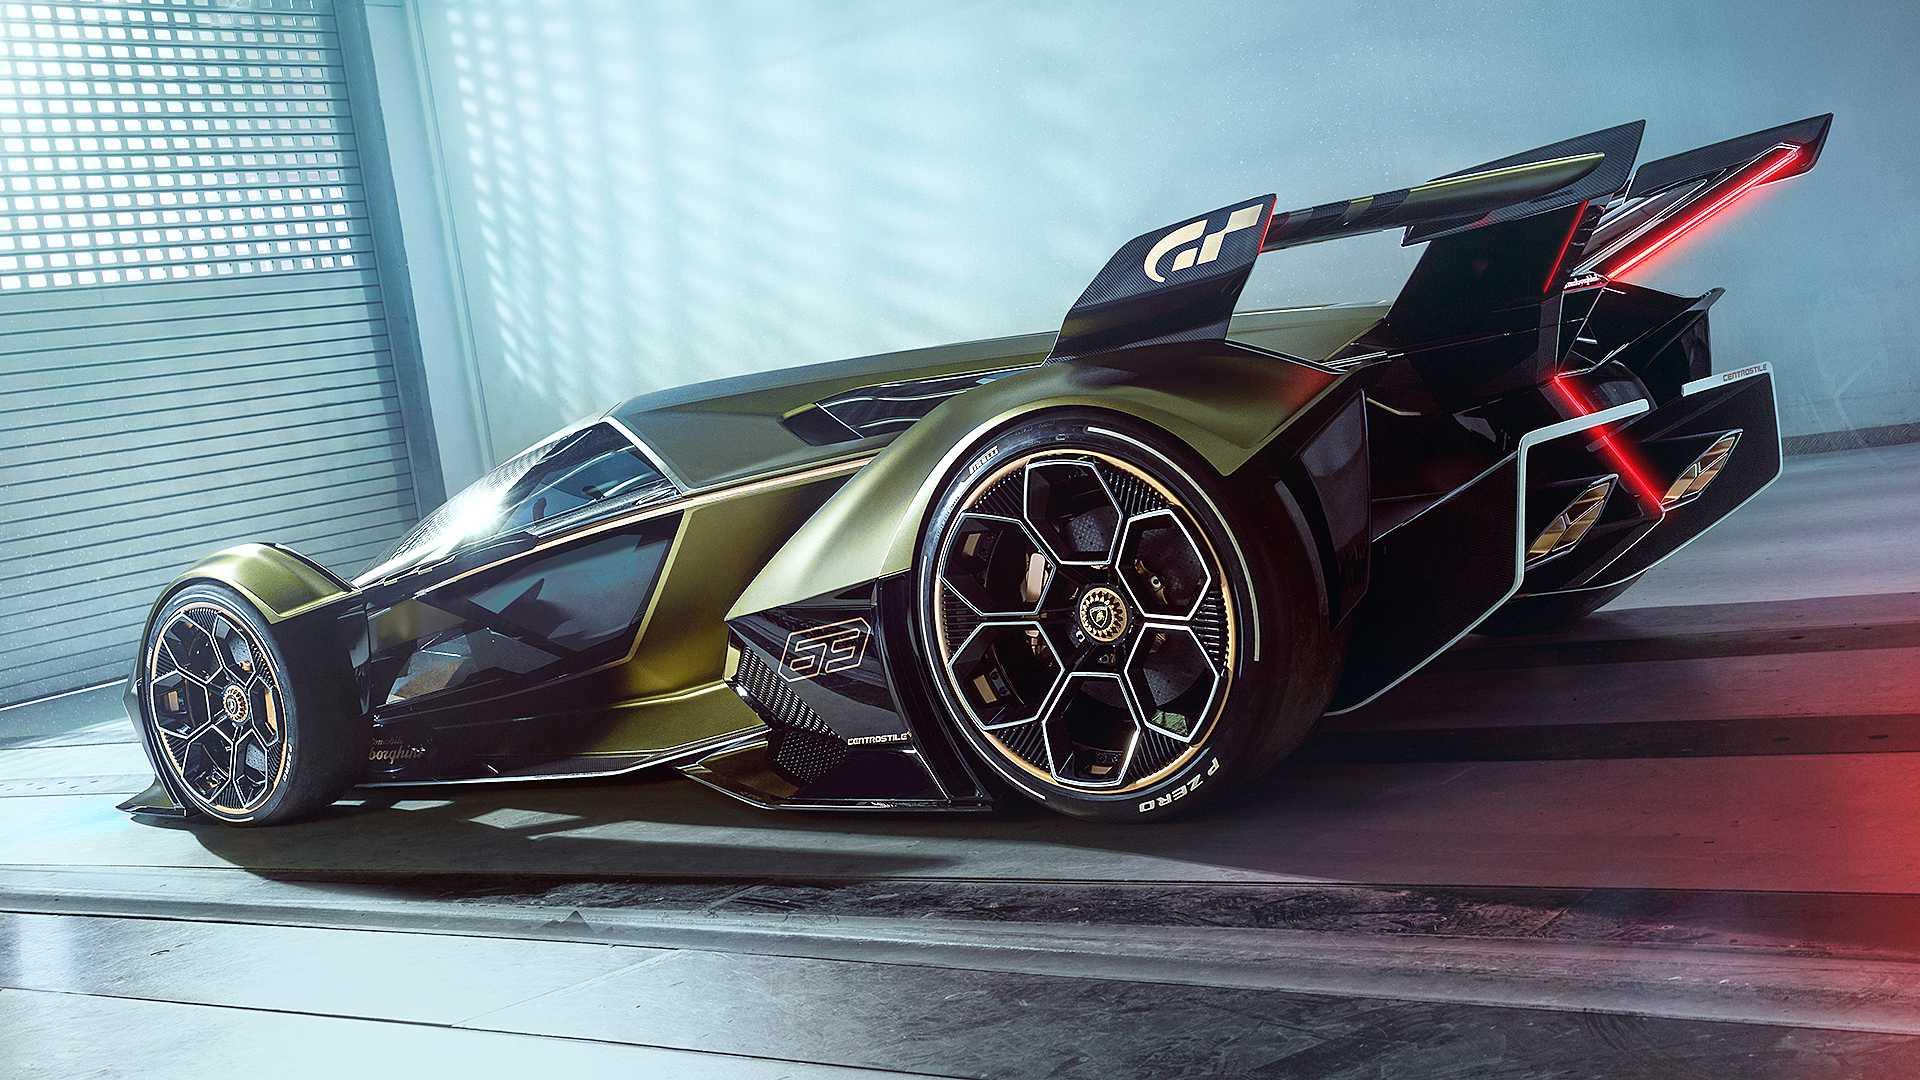 Lamborghini-V12-Vision-Gran-Turismo-9